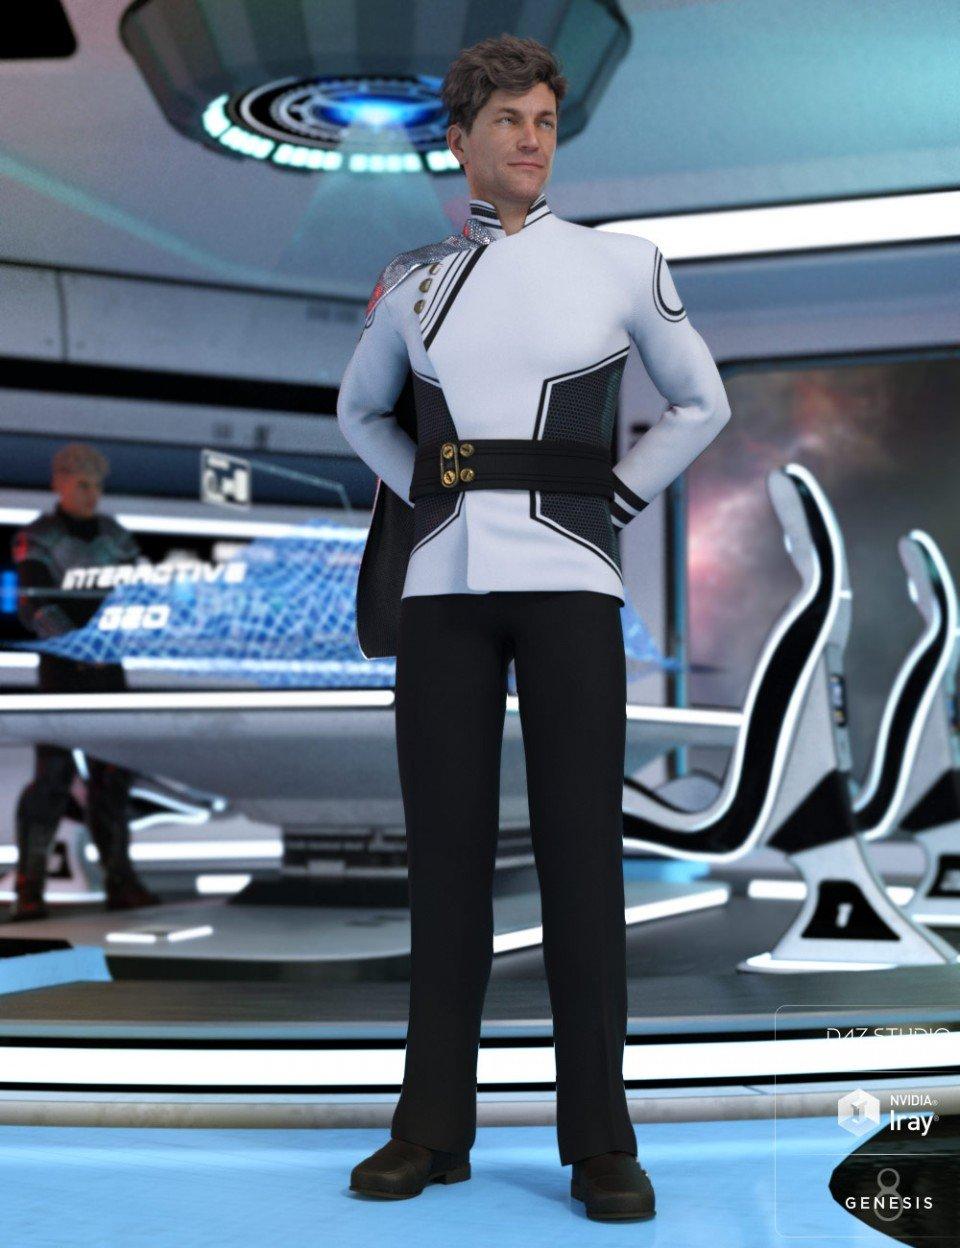 dForce Fleet Commander Outfit for Genesis 8 Male(s)_DAZ3D下载站